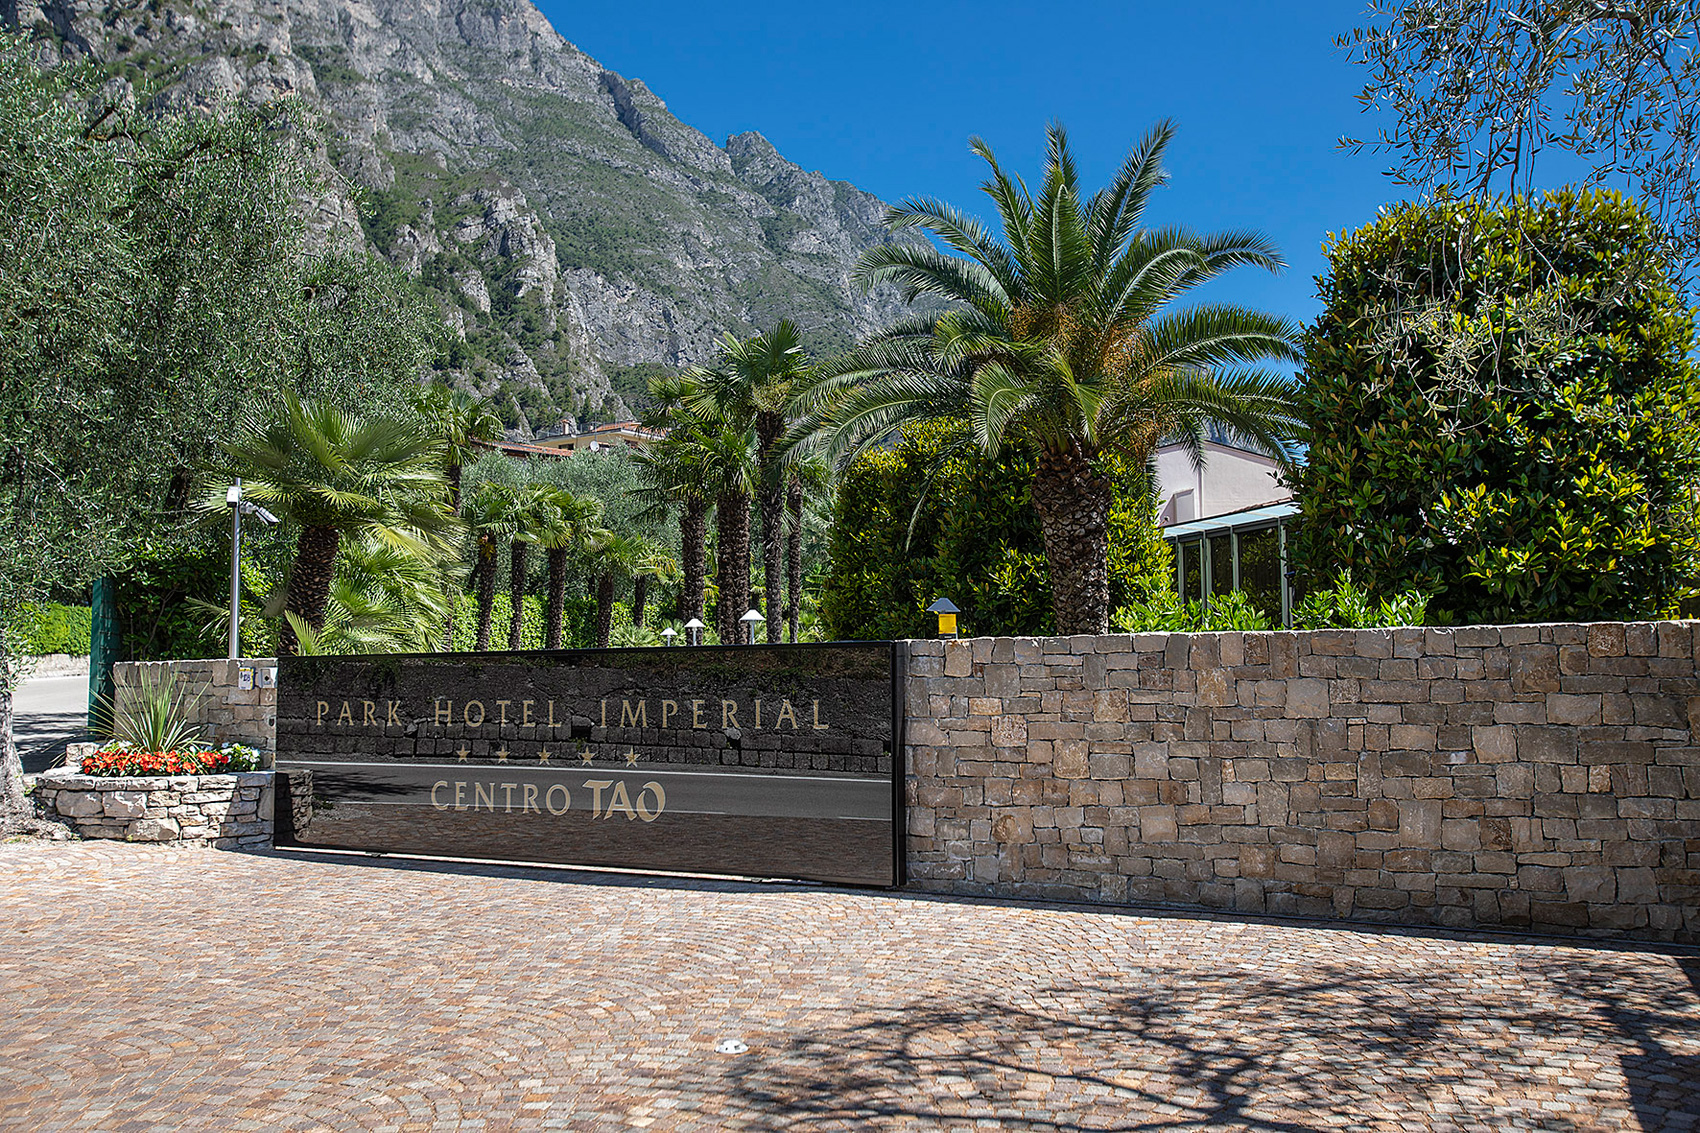 park_hotel_imperial_limone_sul_garda_centro_tao_entrata_hotel704.jpg